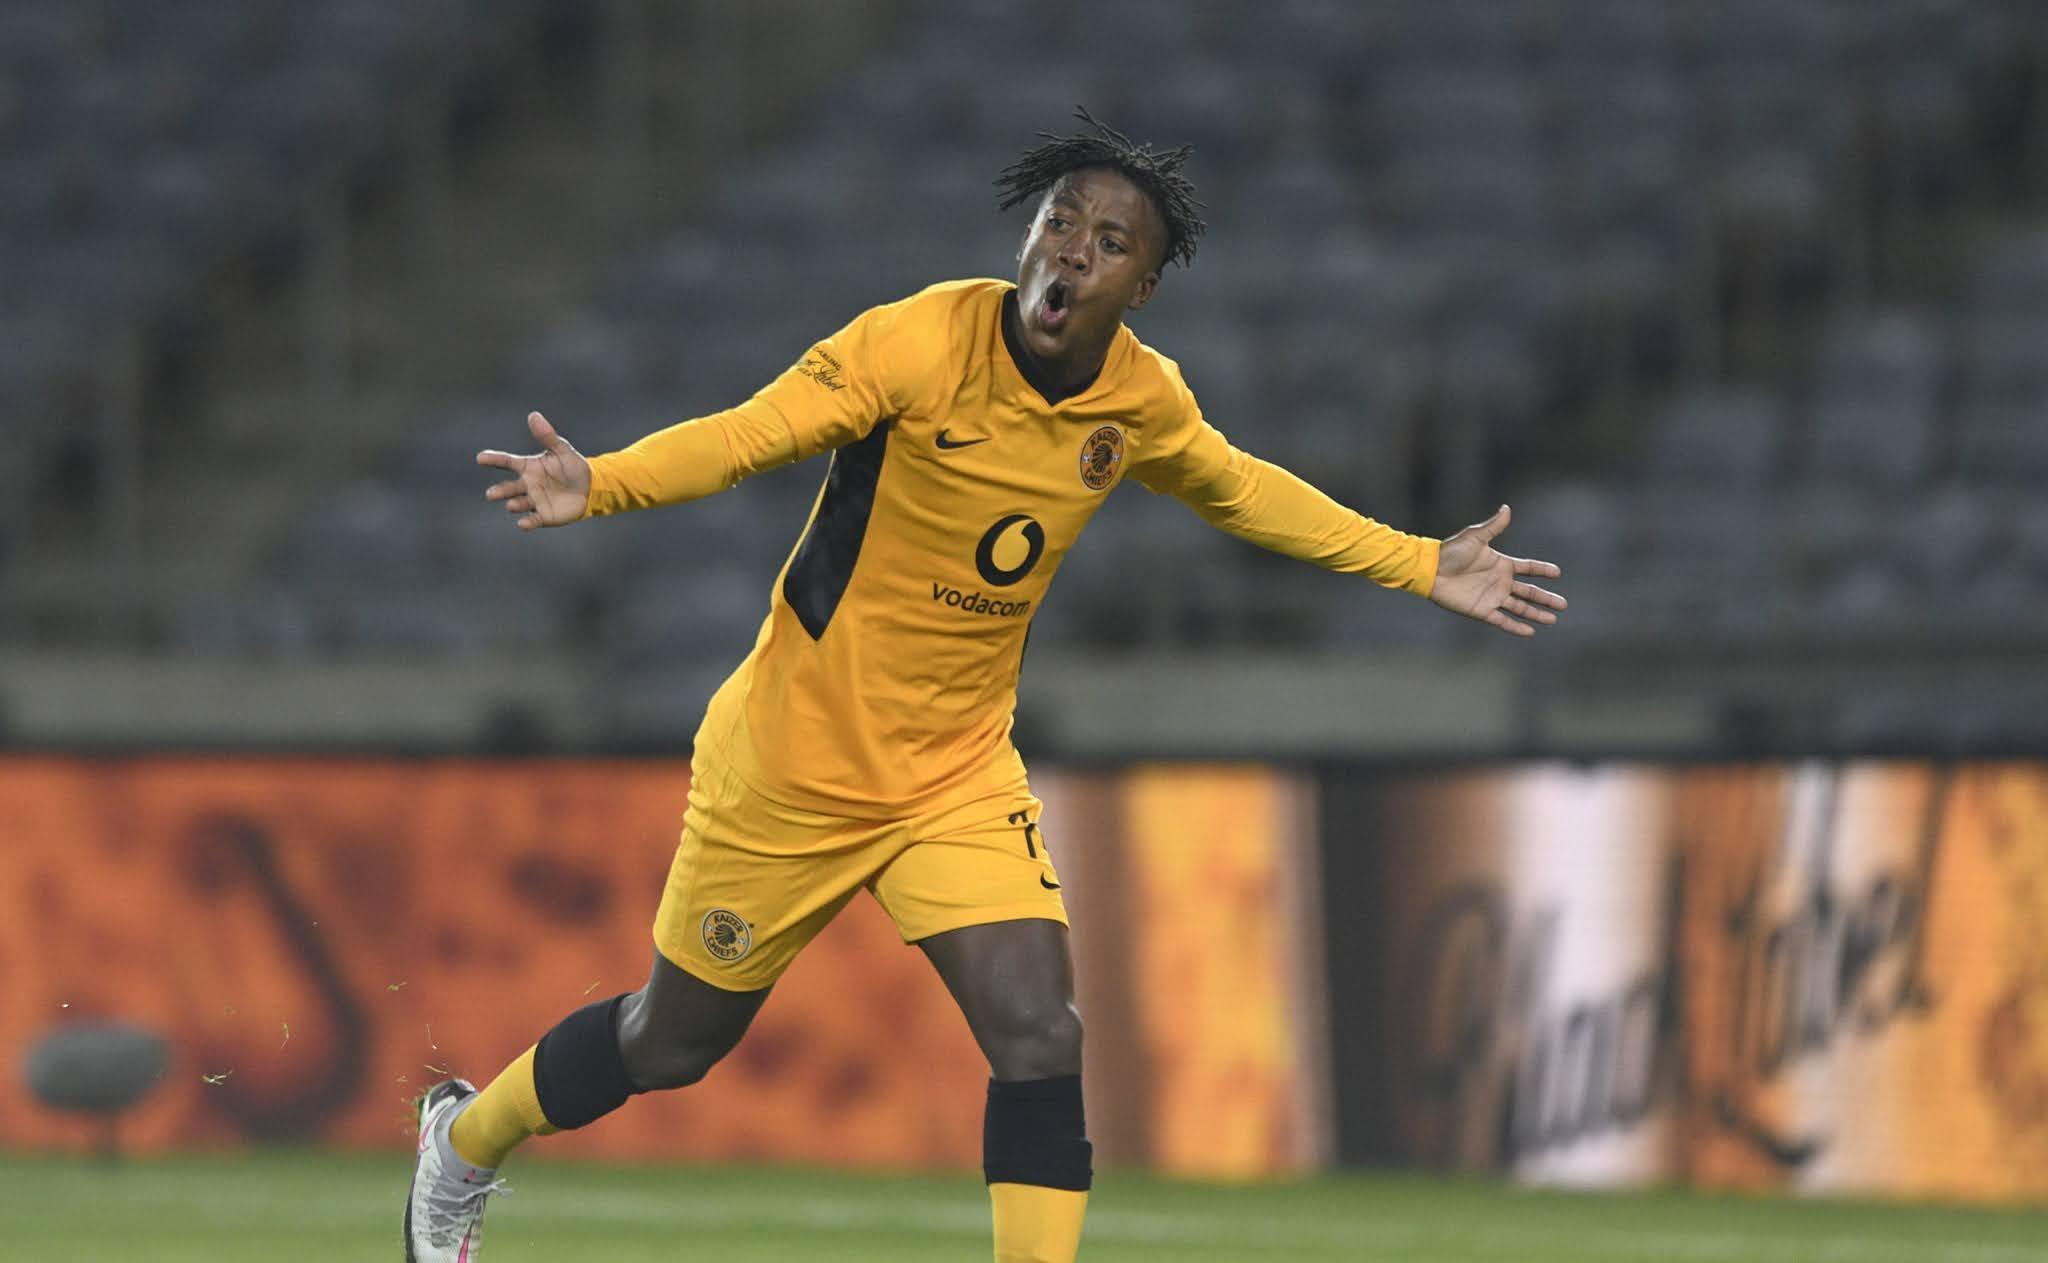 Kaizer Chiefs midfielder Kgaogelo Sekgota